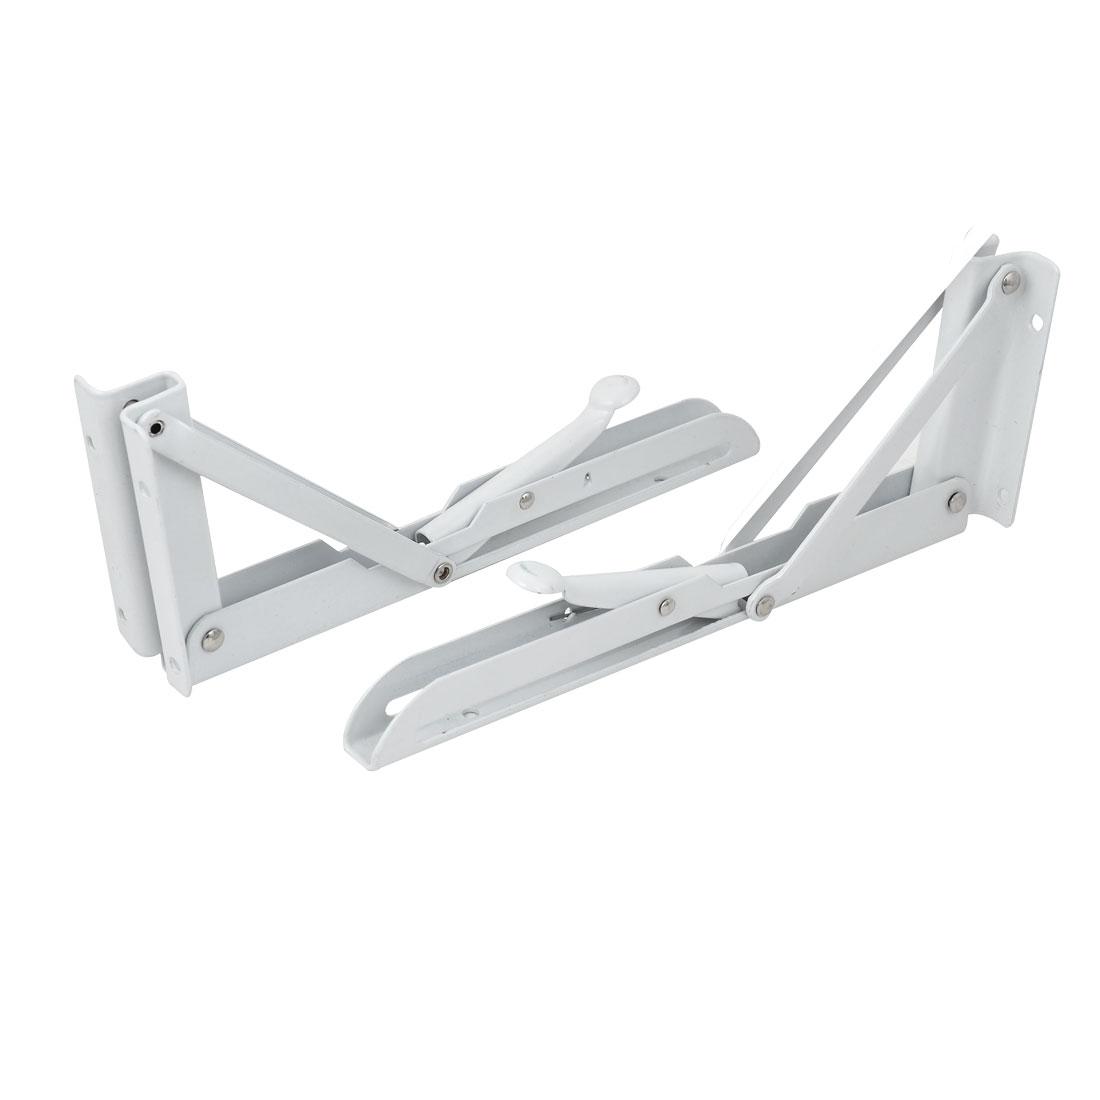 25cmx9cm Metal Long Release Triangle Folding Support Shelf Bracket Brace White 2pcs